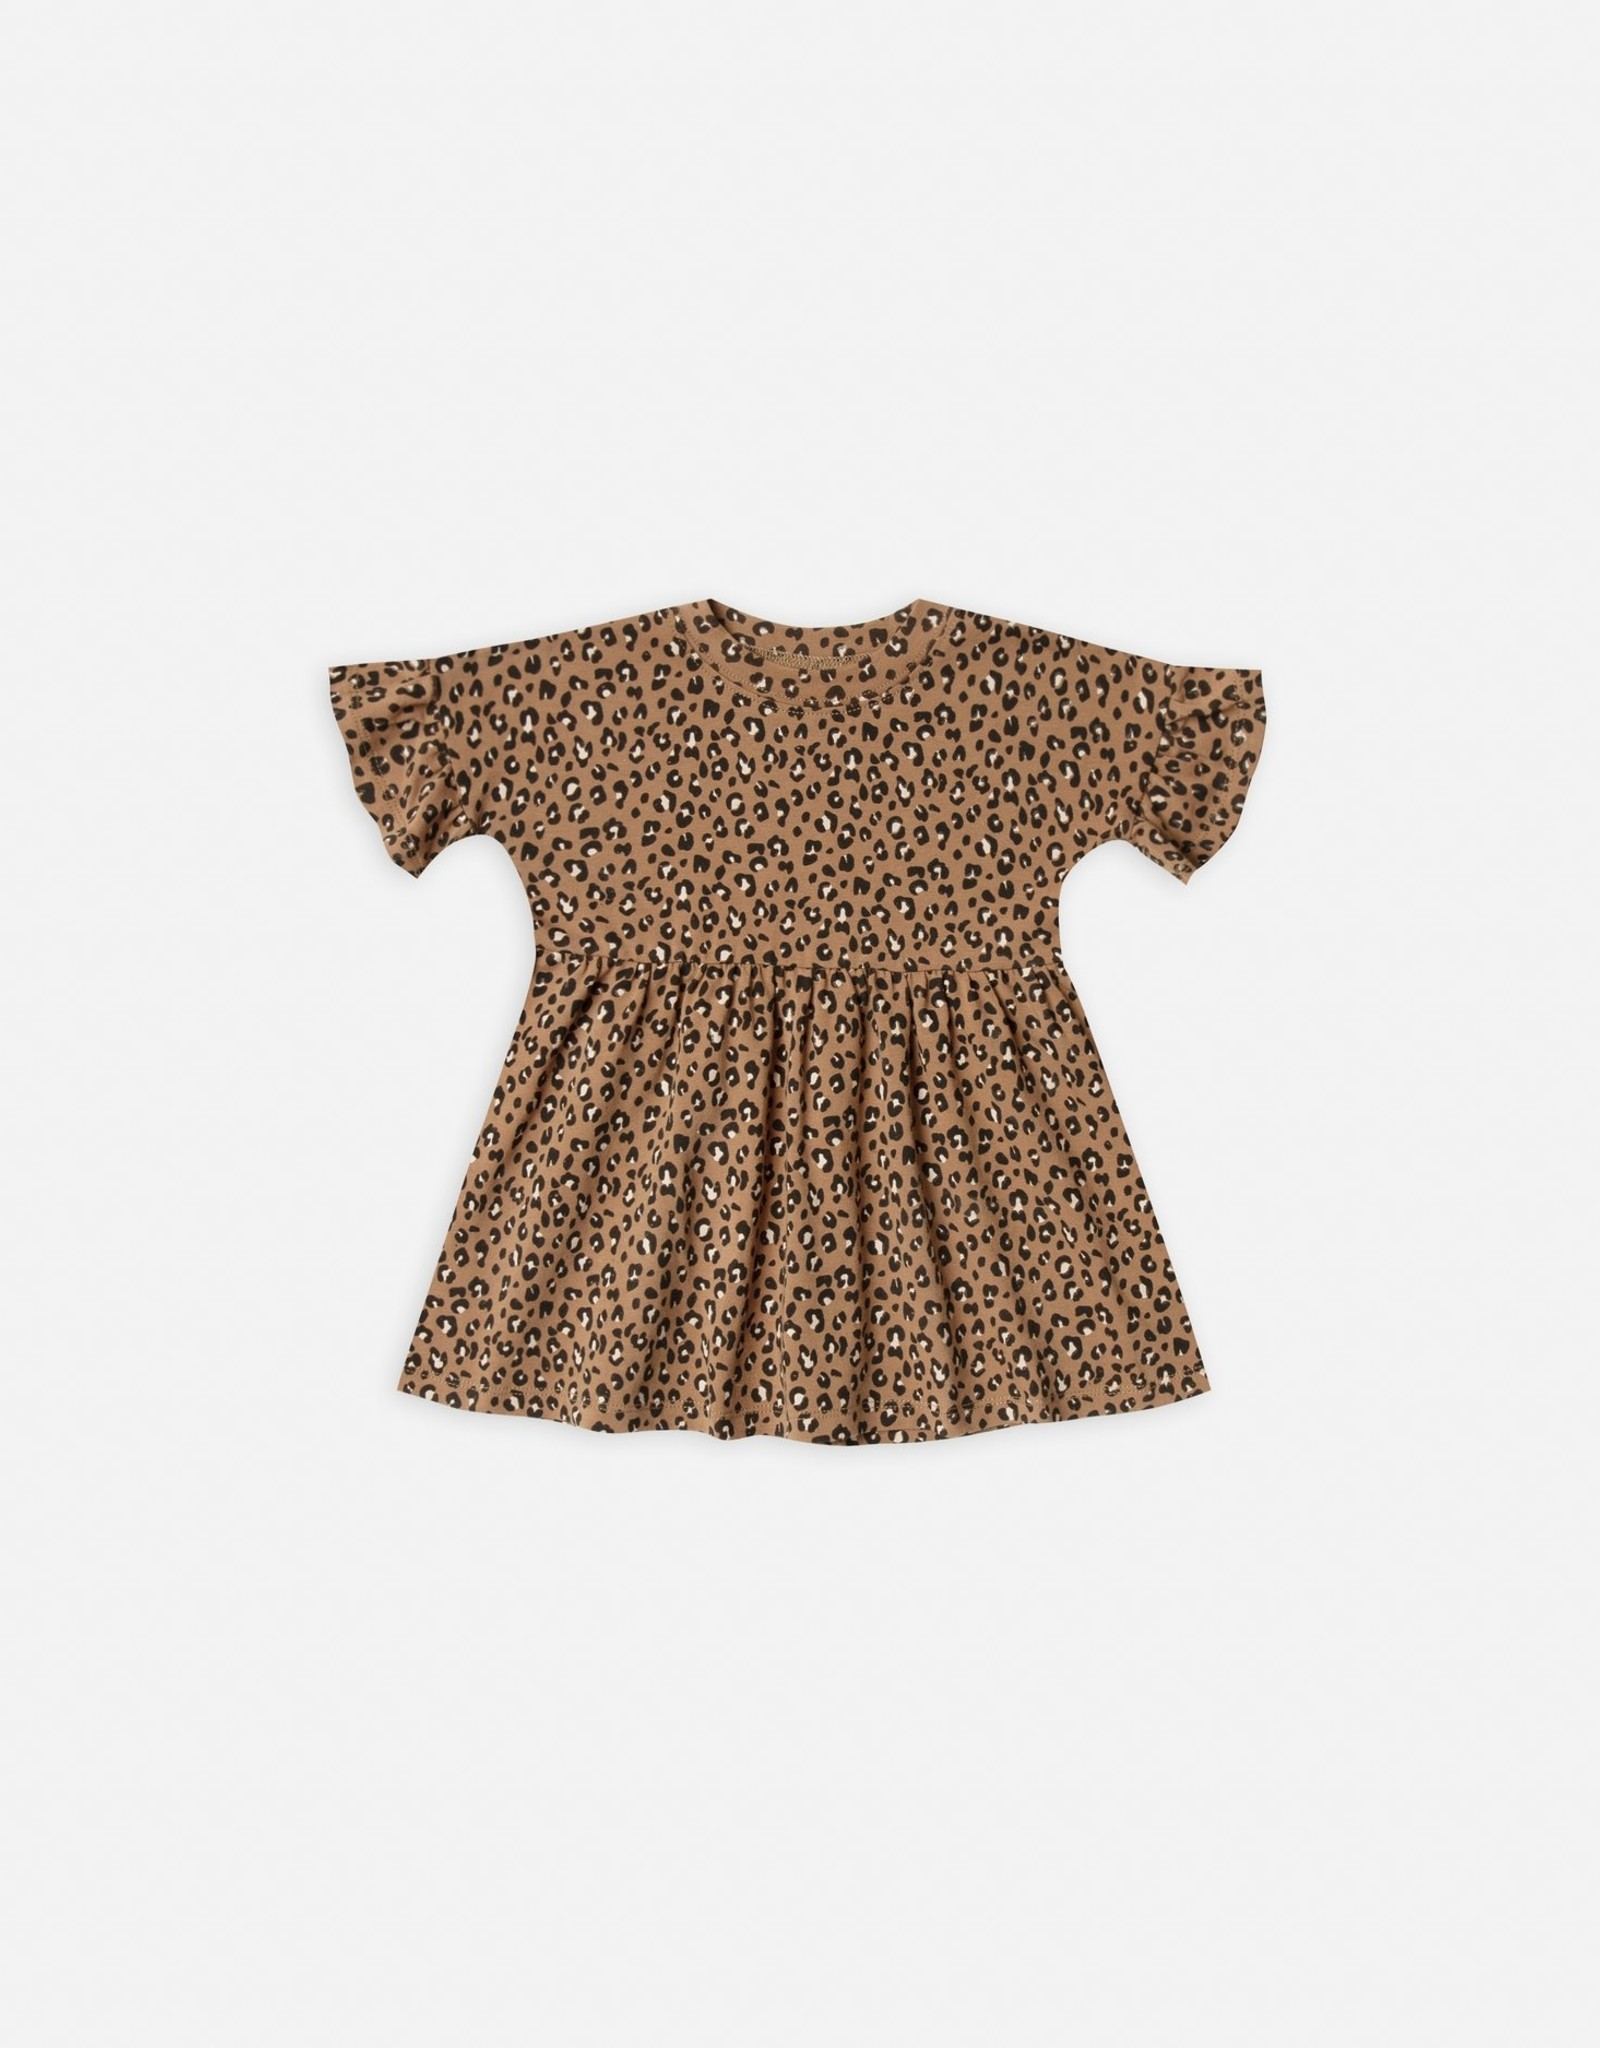 Cheetah Babydoll Dress